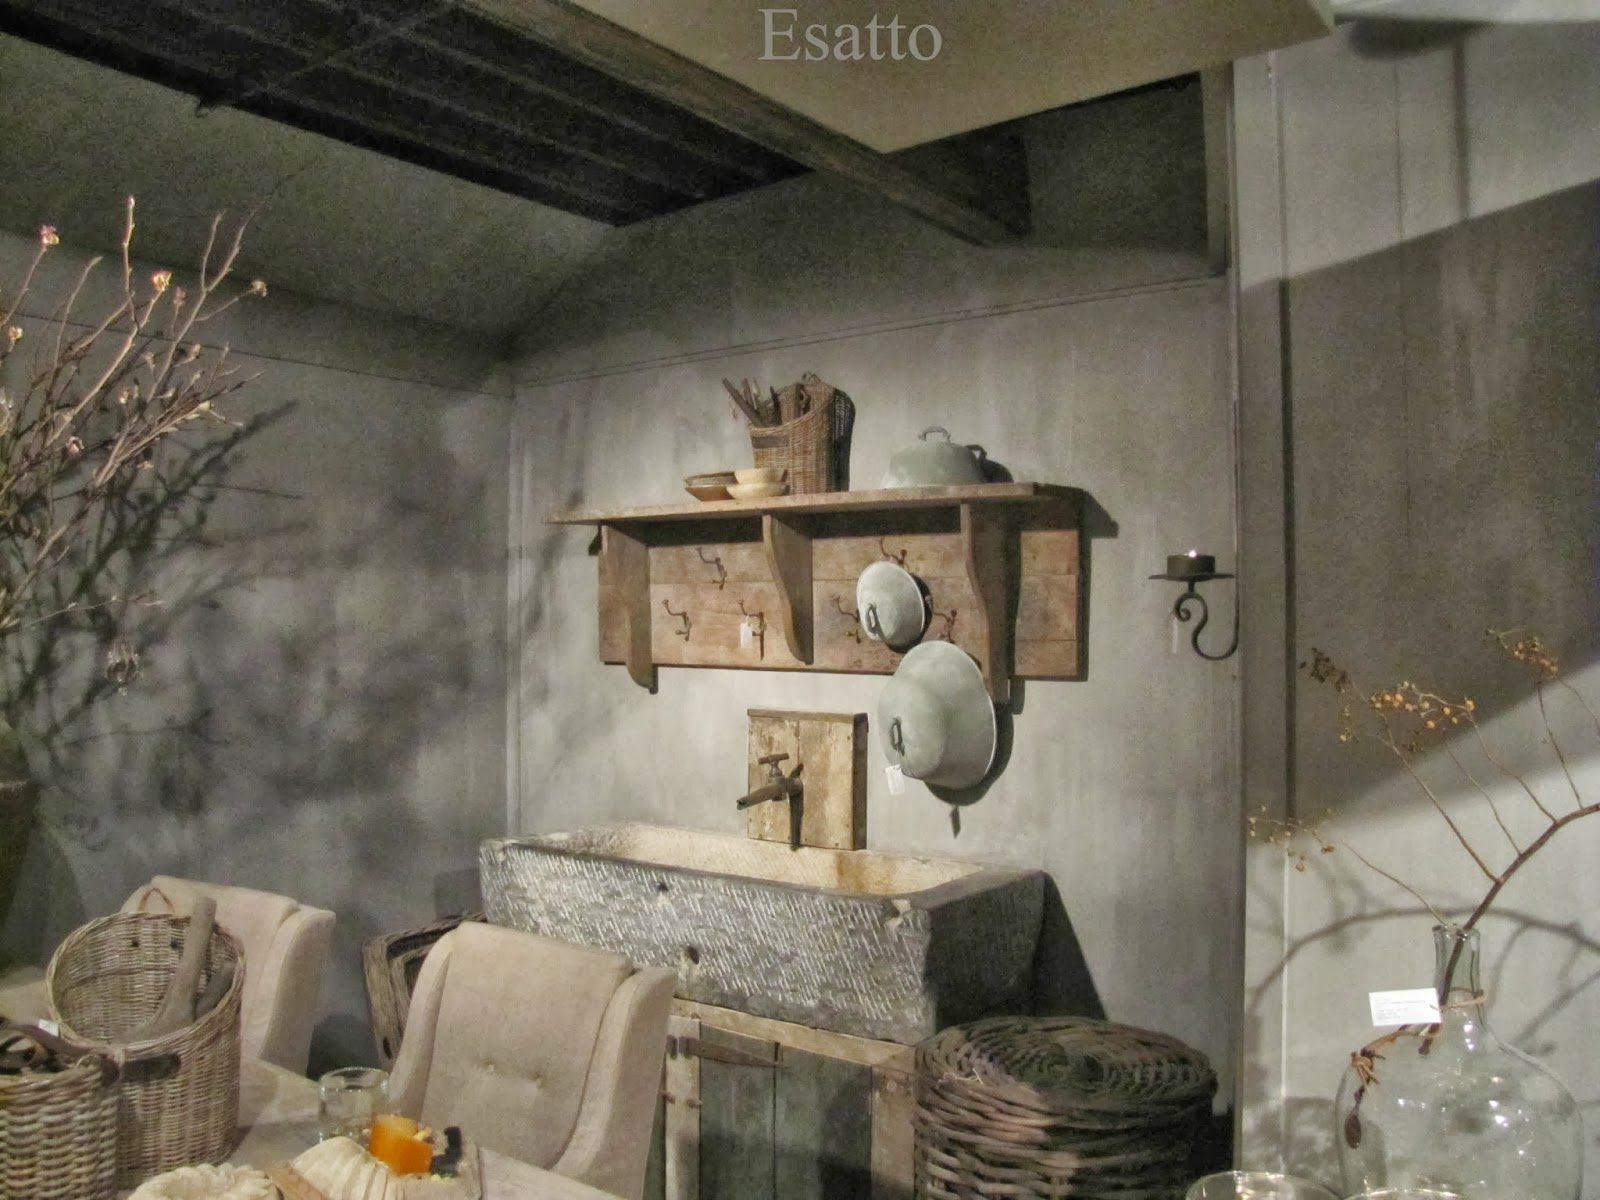 Esatto by Ravensbergen: Wonen Landelijke Stijl Woonkamer by Hoffz